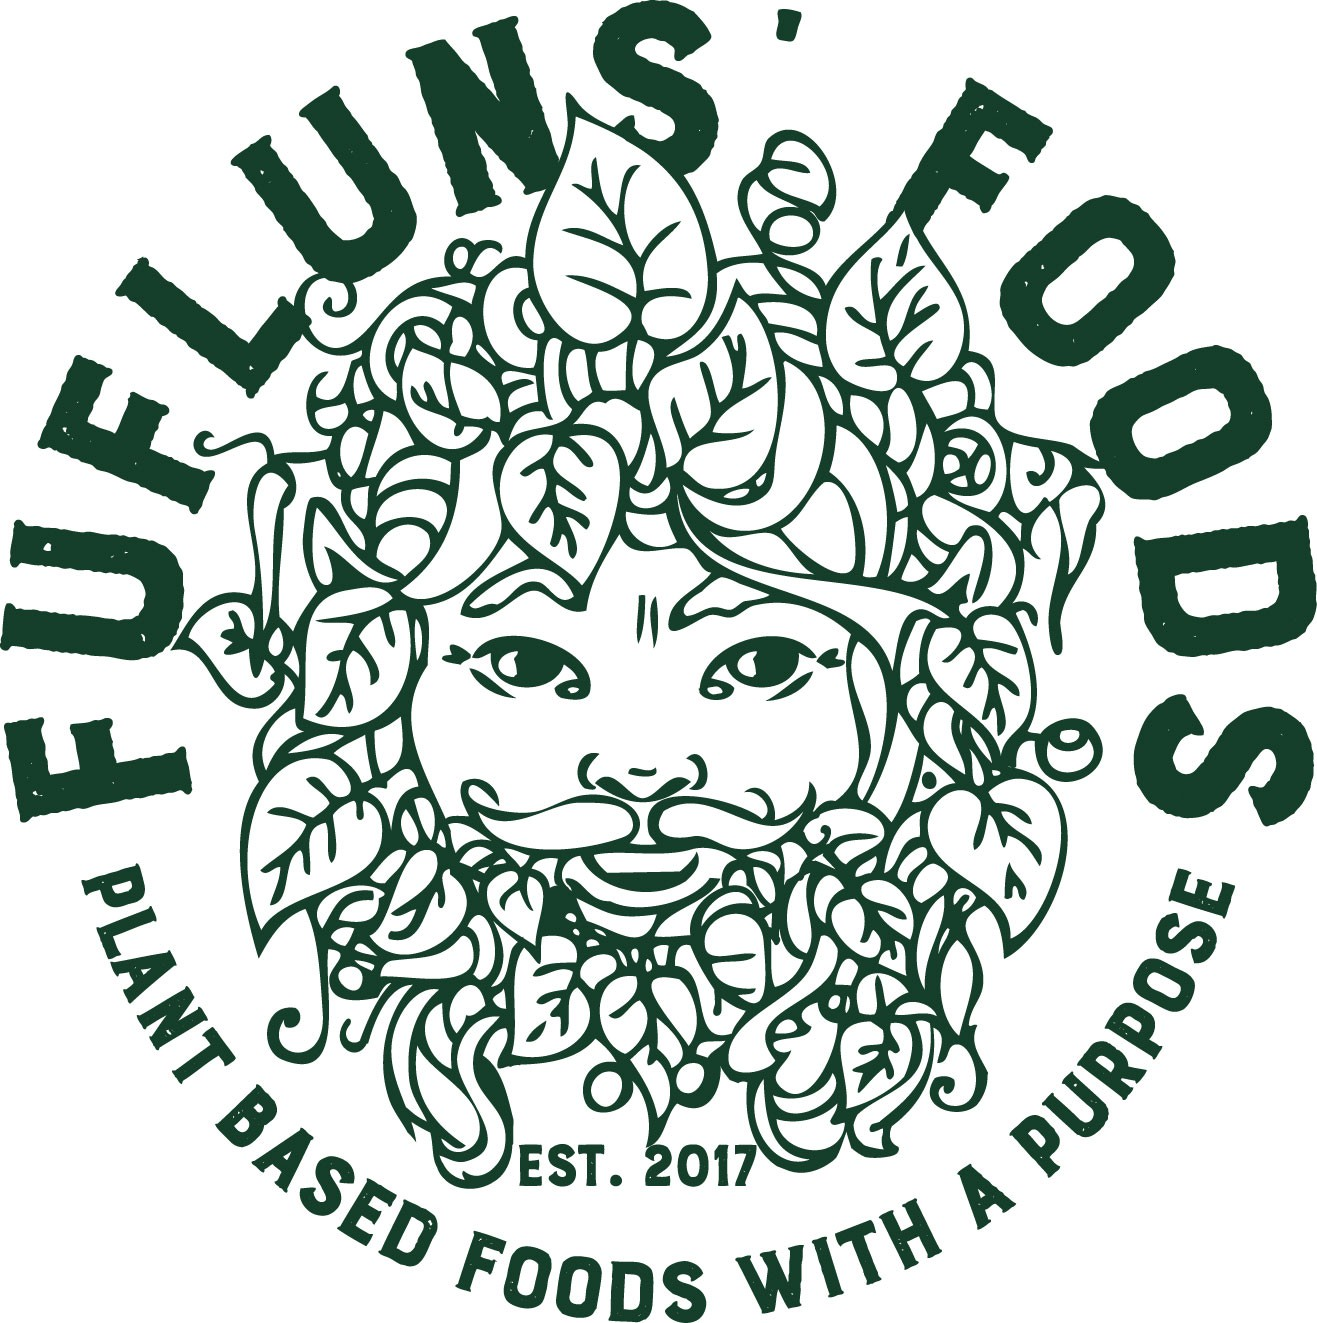 Mythological veggie mascot for a food and beverage company